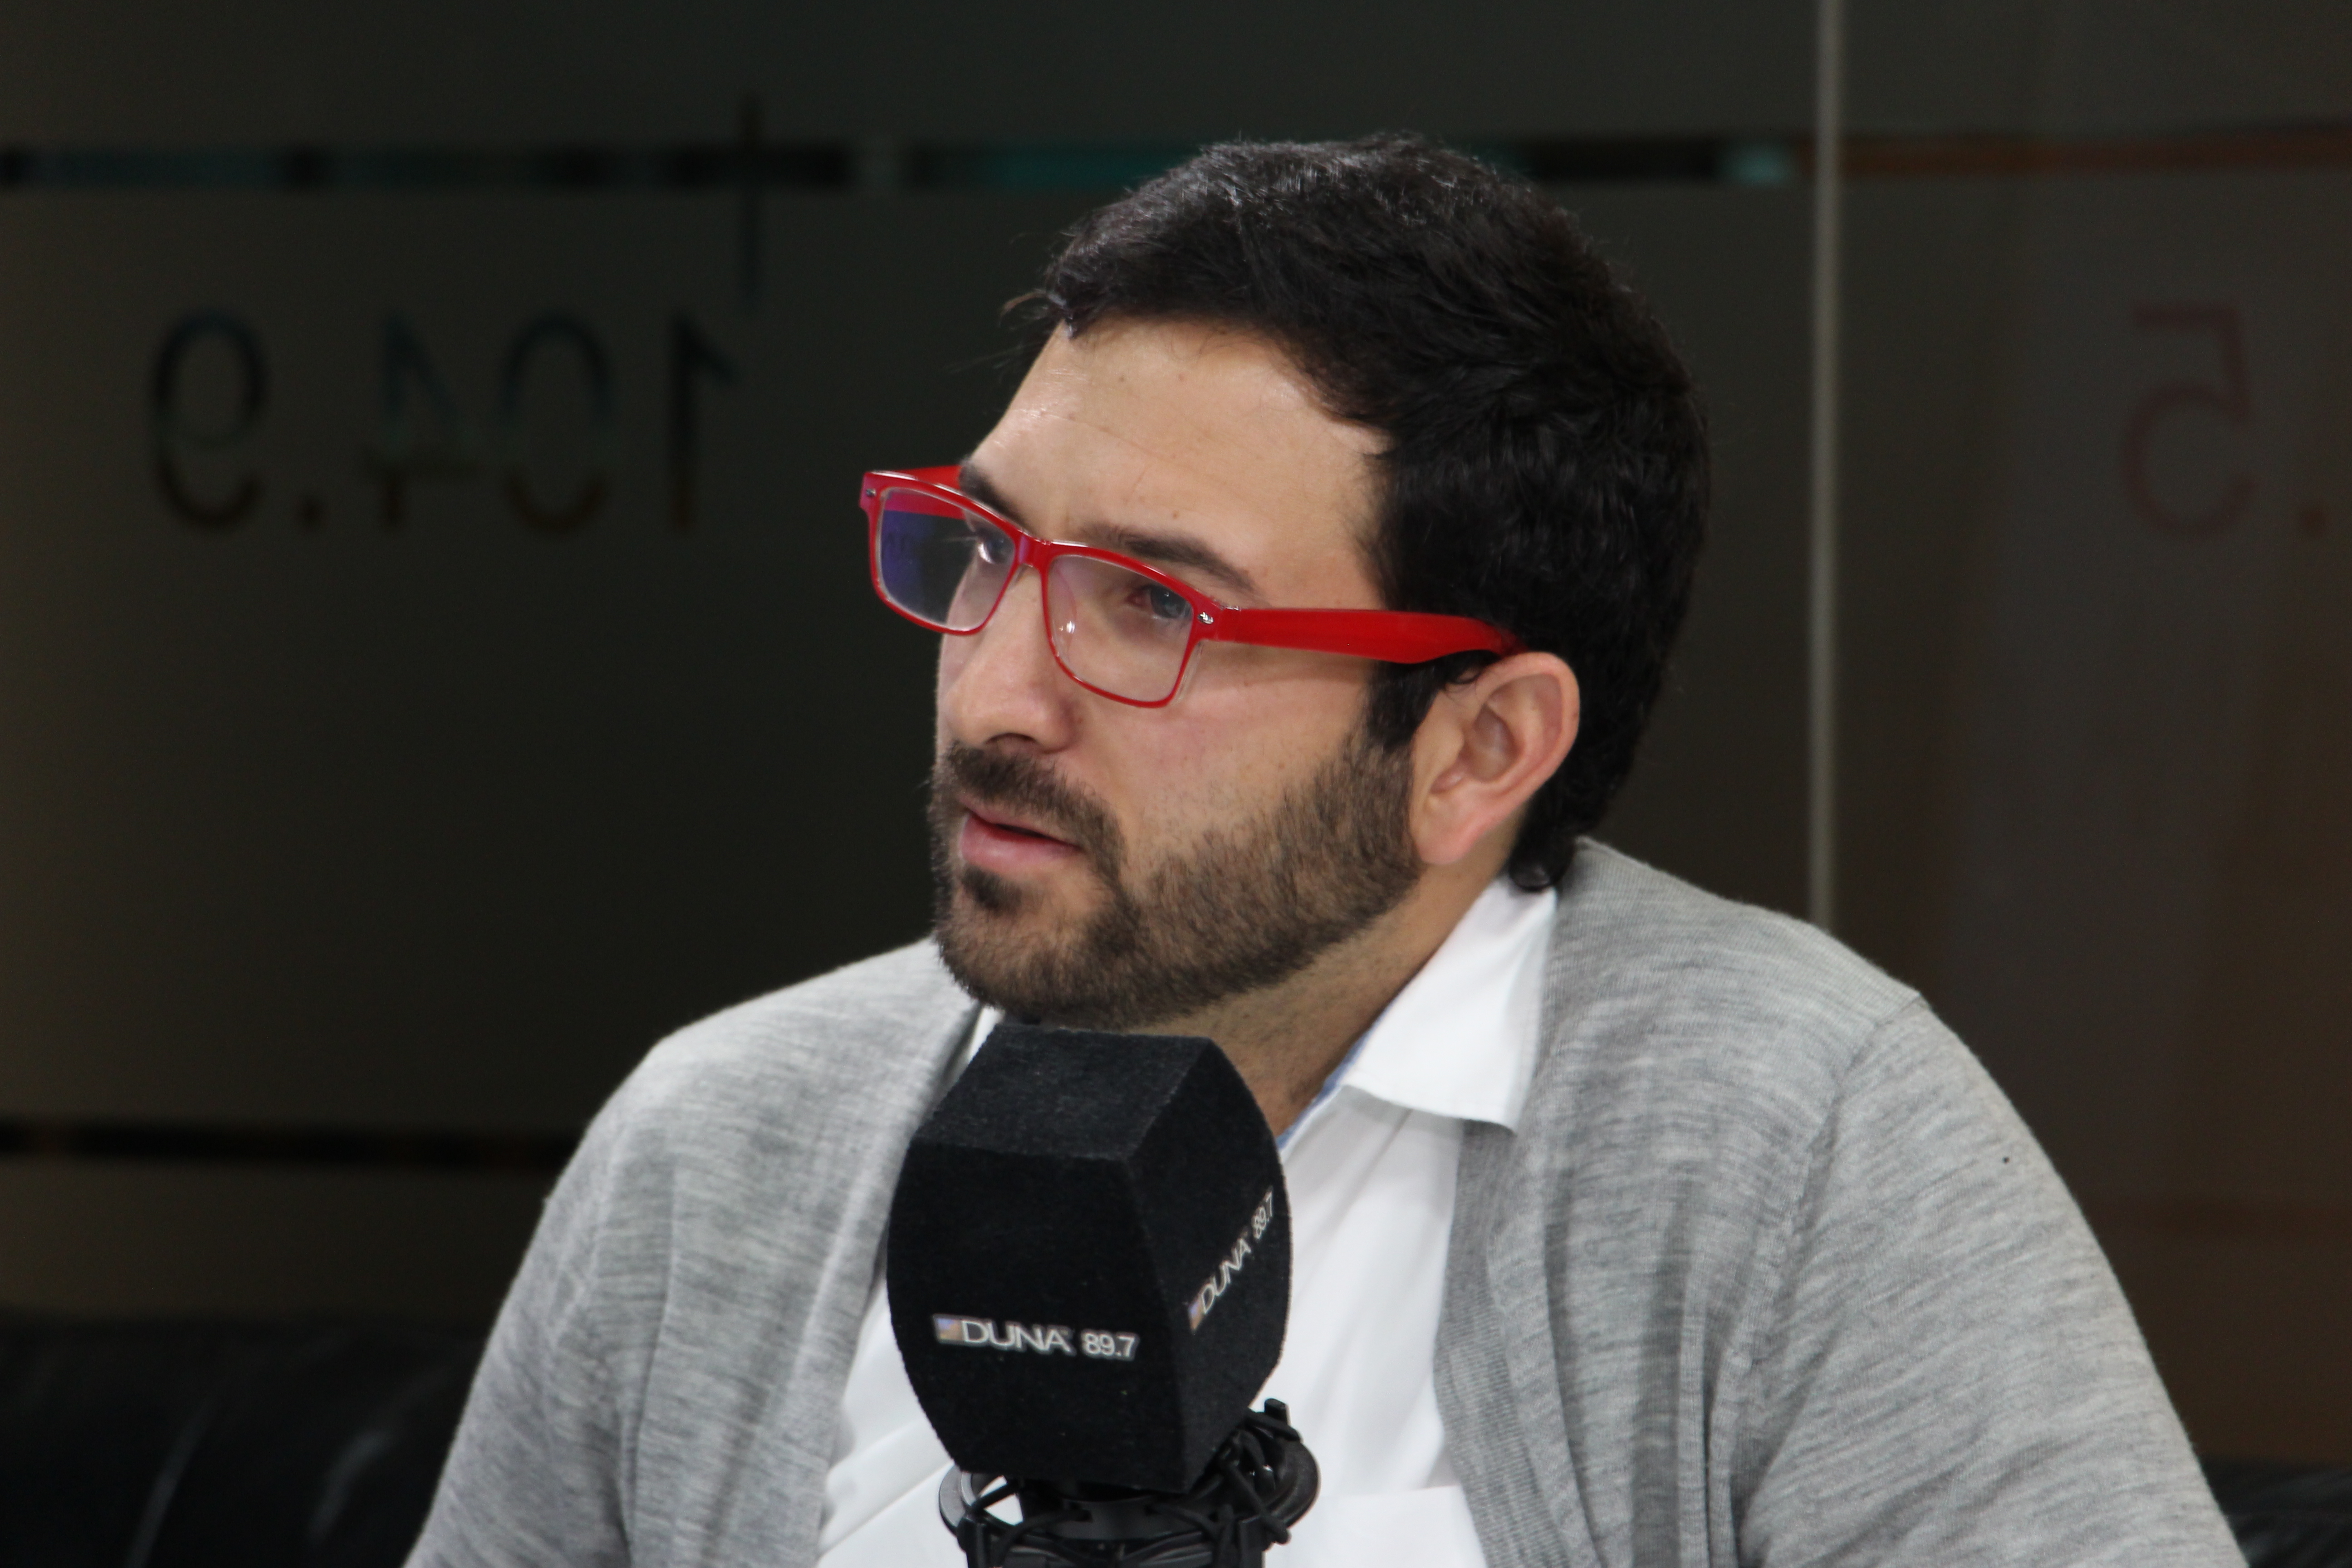 Miguel Crispi